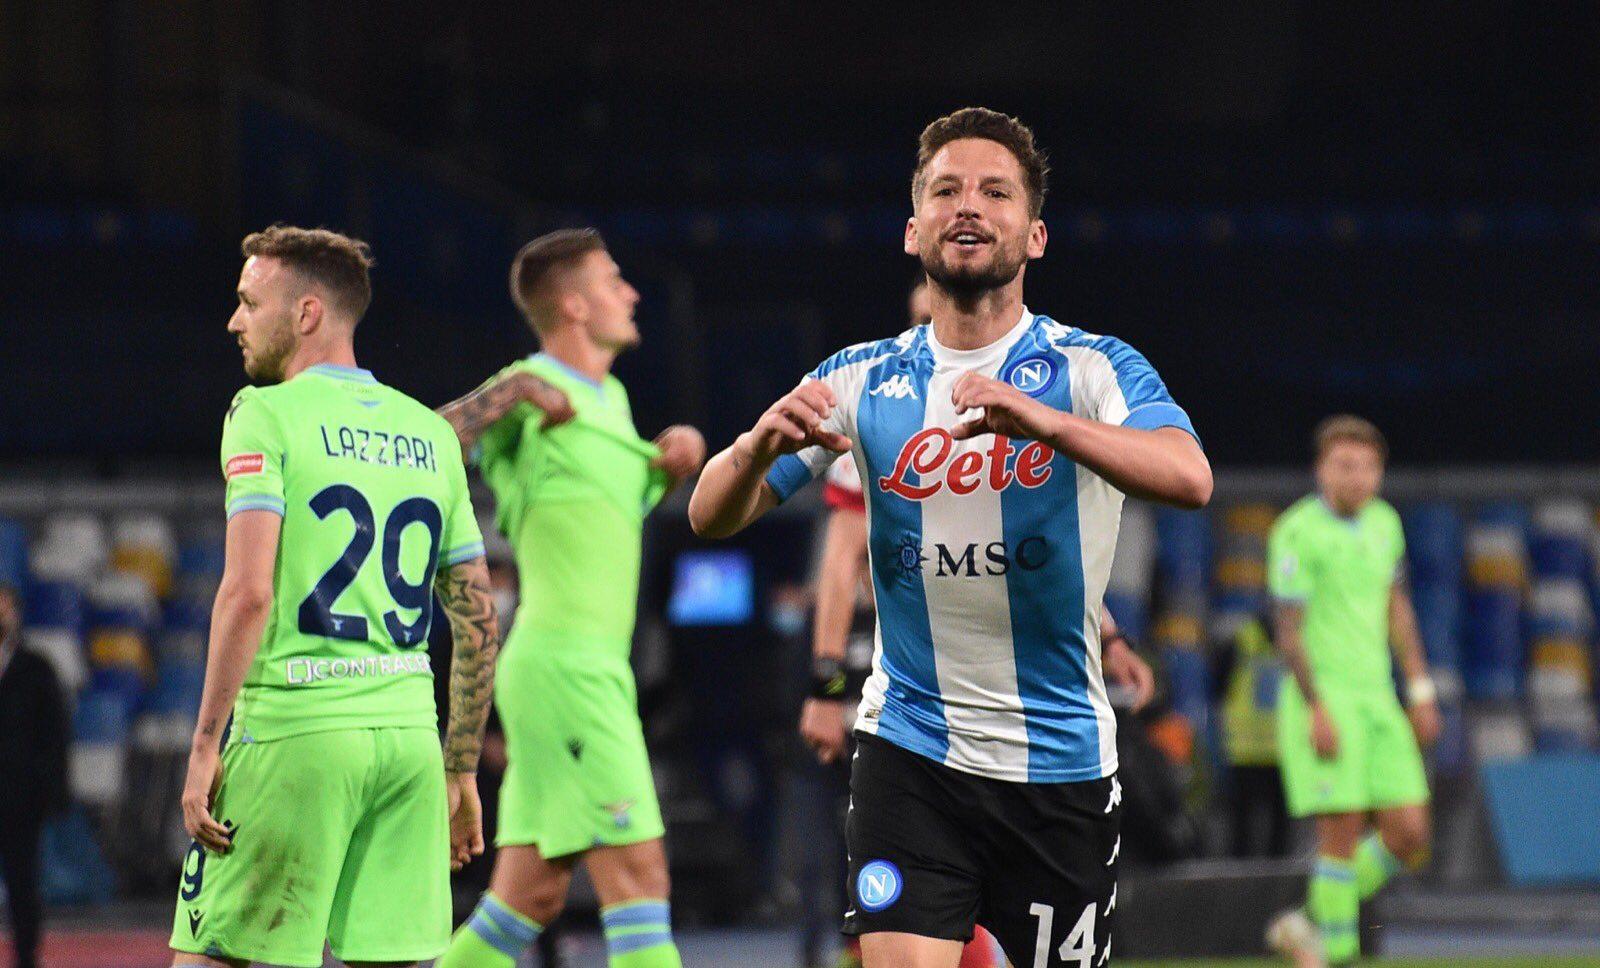 ملخص واهداف مباراة نابولي ولاتسيو (5-2) الدوري الايطالي